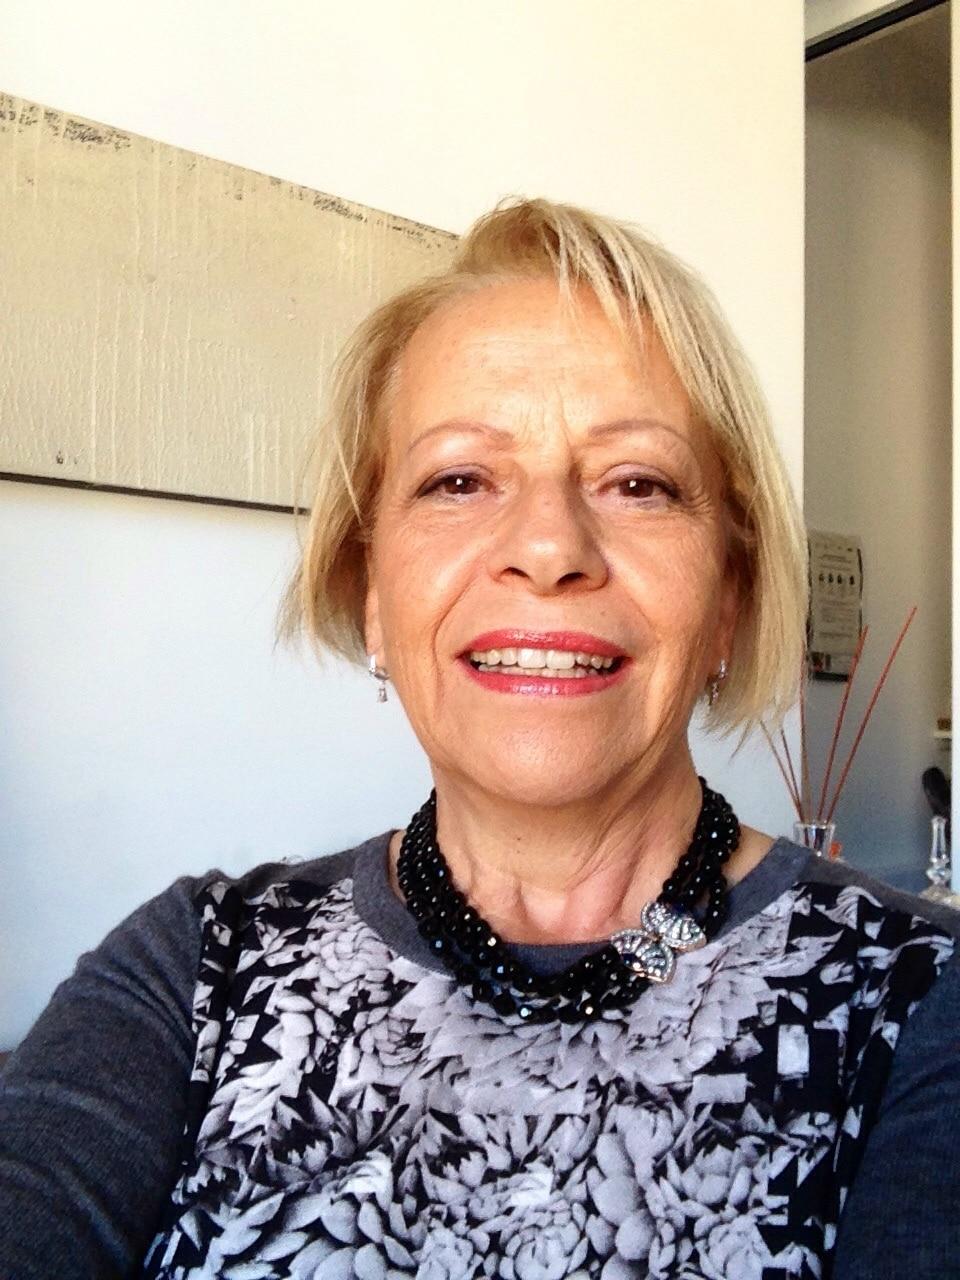 Marialucia from Perugia